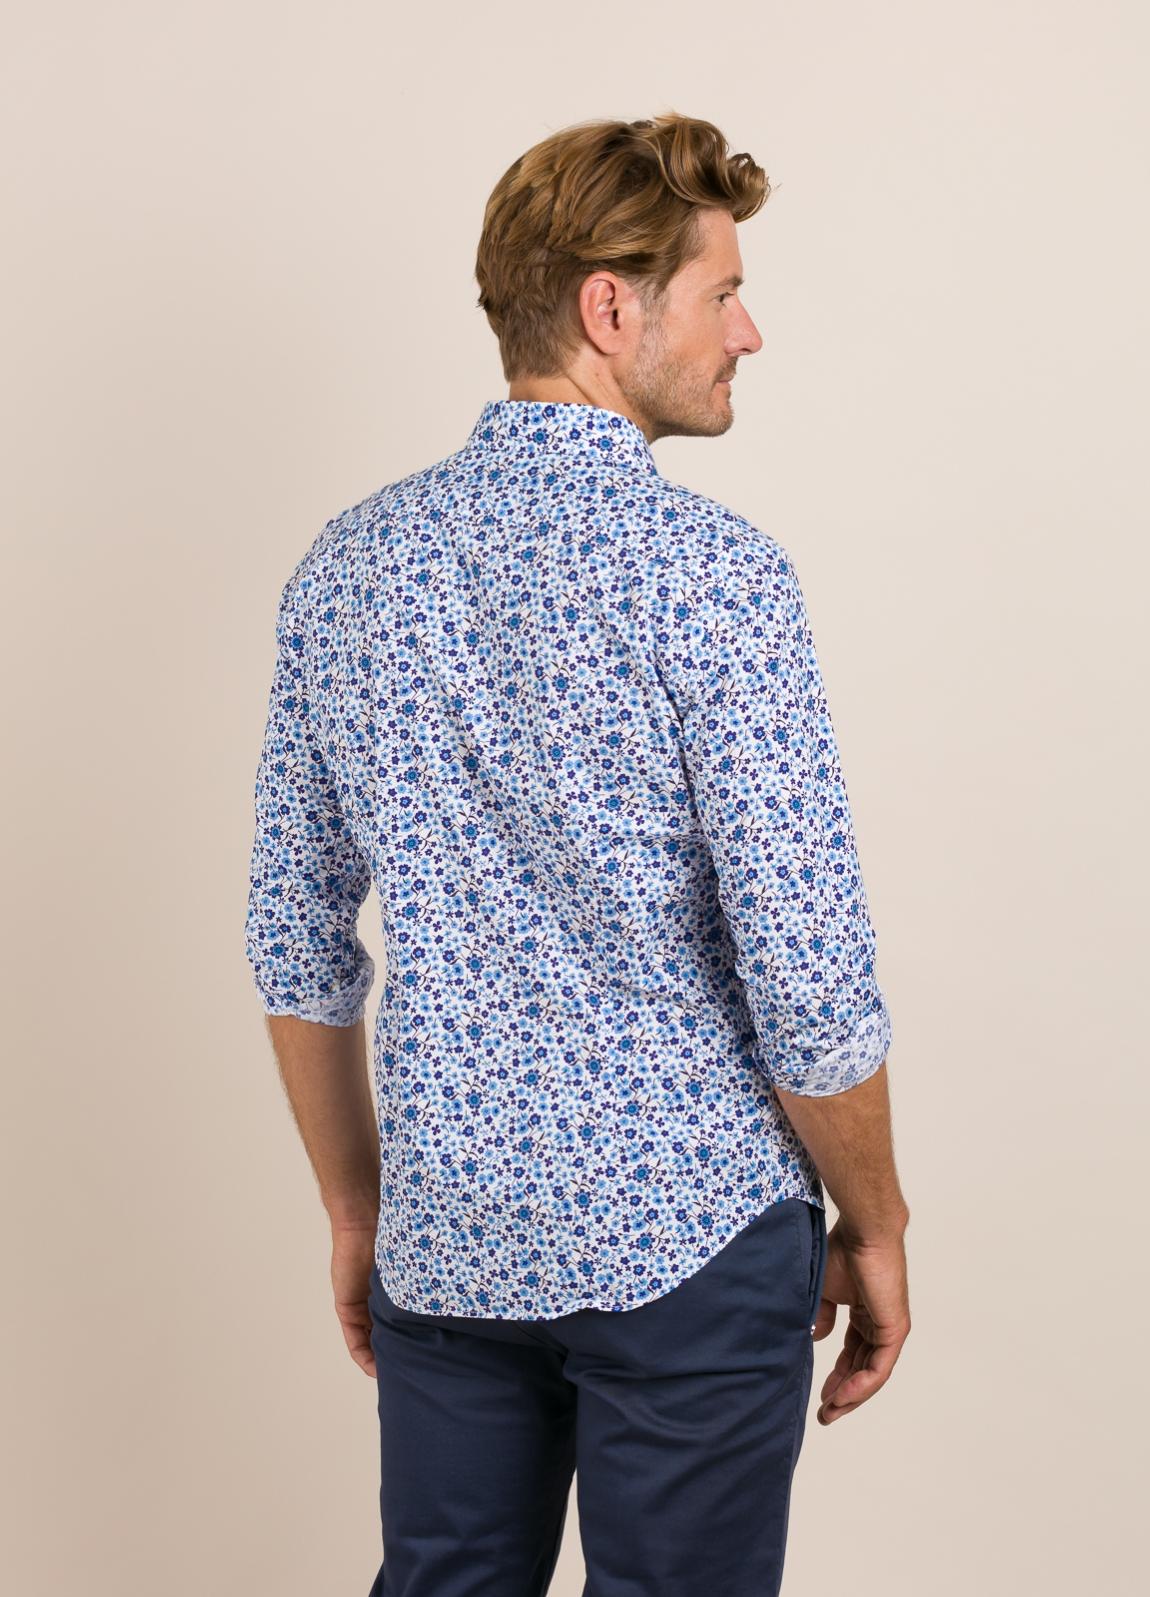 Camisa Casual Wear FUREST COLECCIÓN slim fit. - Ítem2